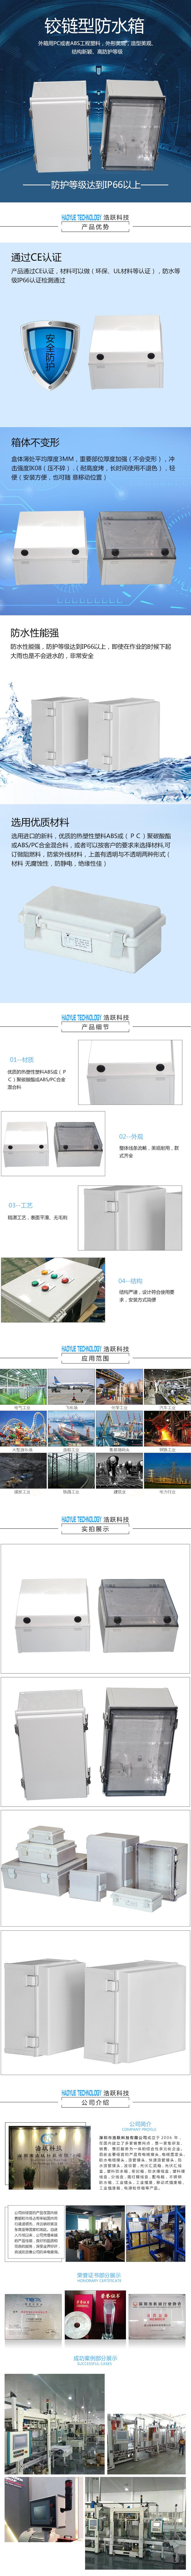 TIBOX 控制箱 仪表盒防护等级